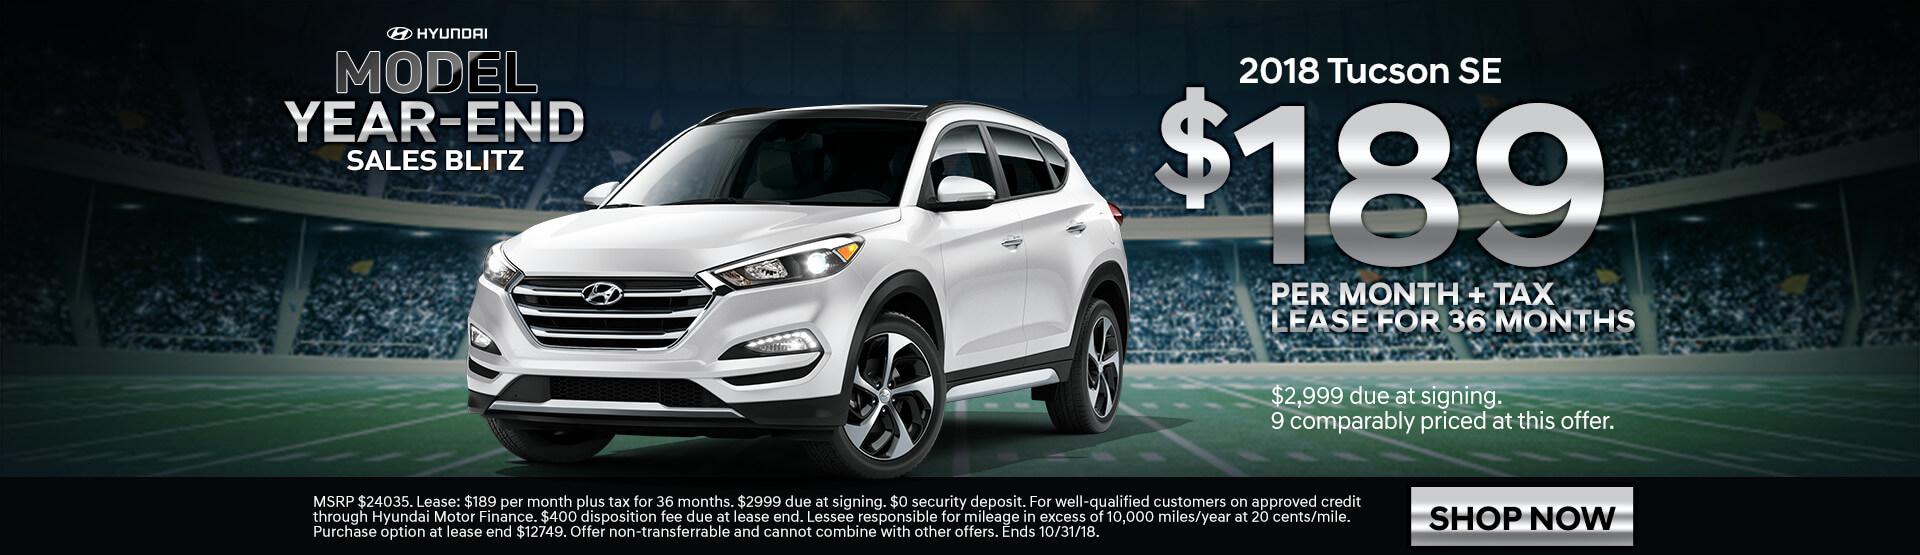 Las Vegas Hyundai Dealers. Registration · Elantra · Tucson